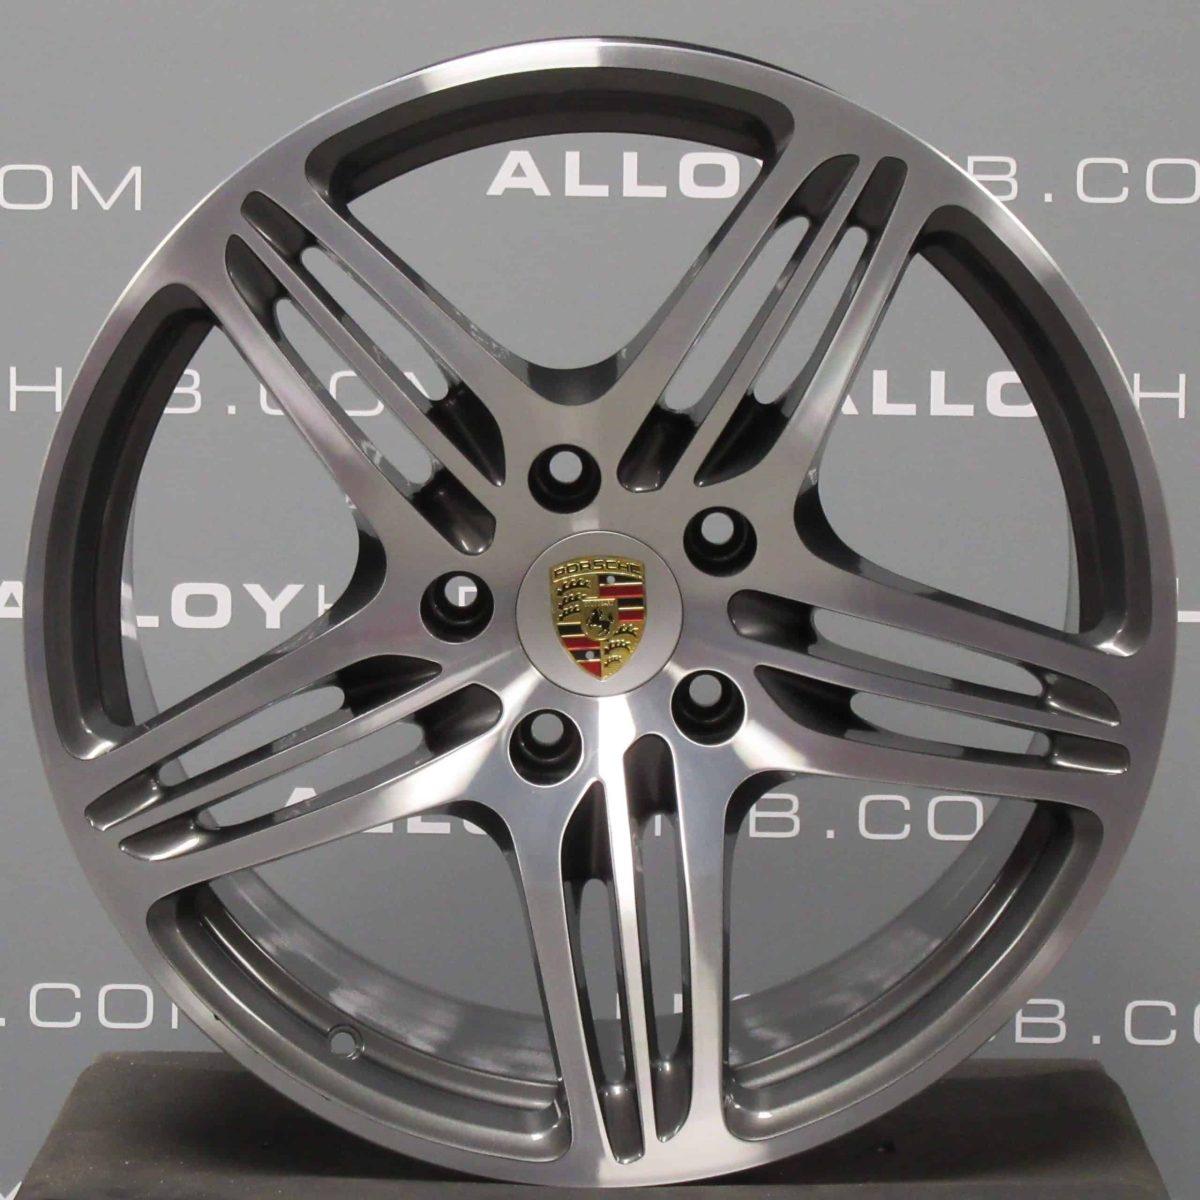 "Genuine Porsche 911 997 Turbo II 19"" Inch Alloy Wheels with Grey & Diamond Turned Finish 99736215605 99736216202"